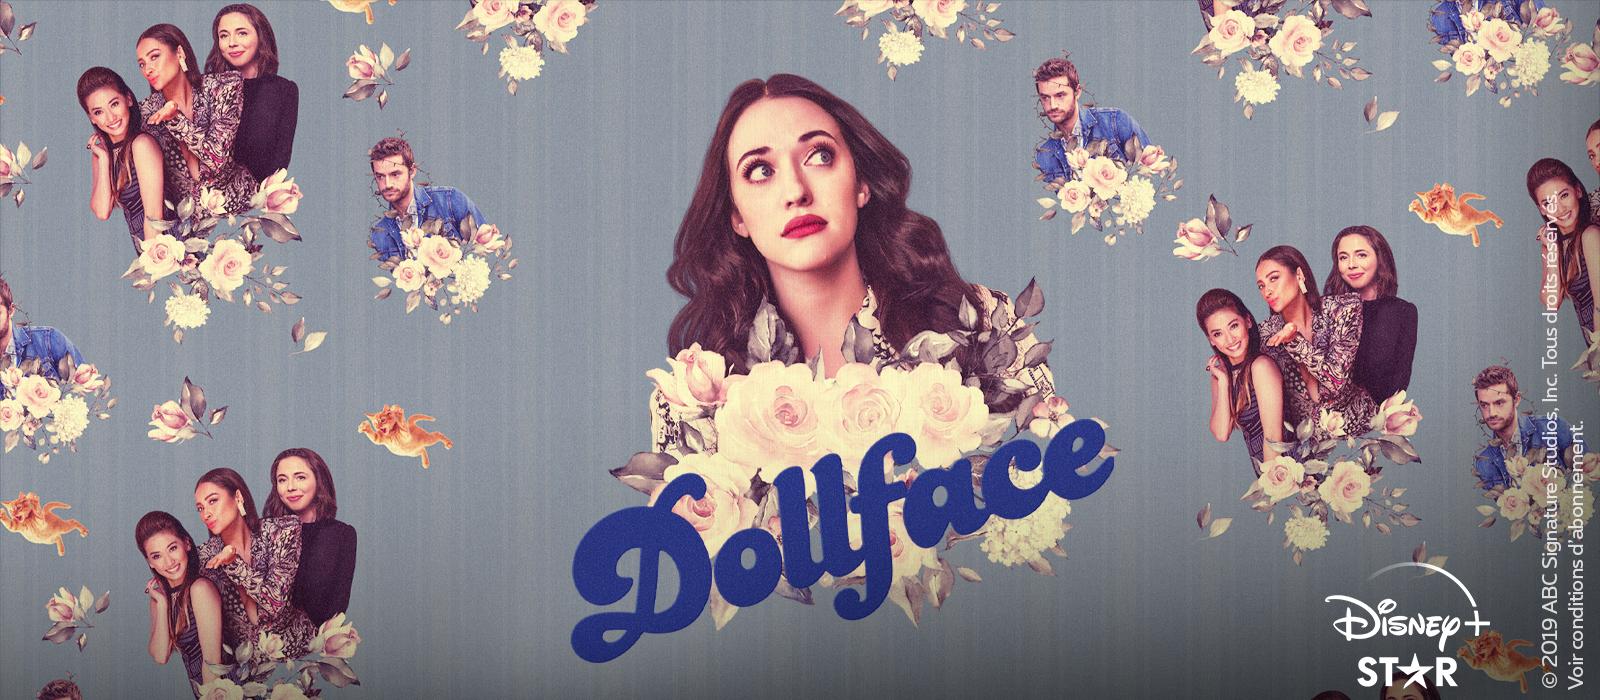 Dollface en streaming sur Star de Disney+